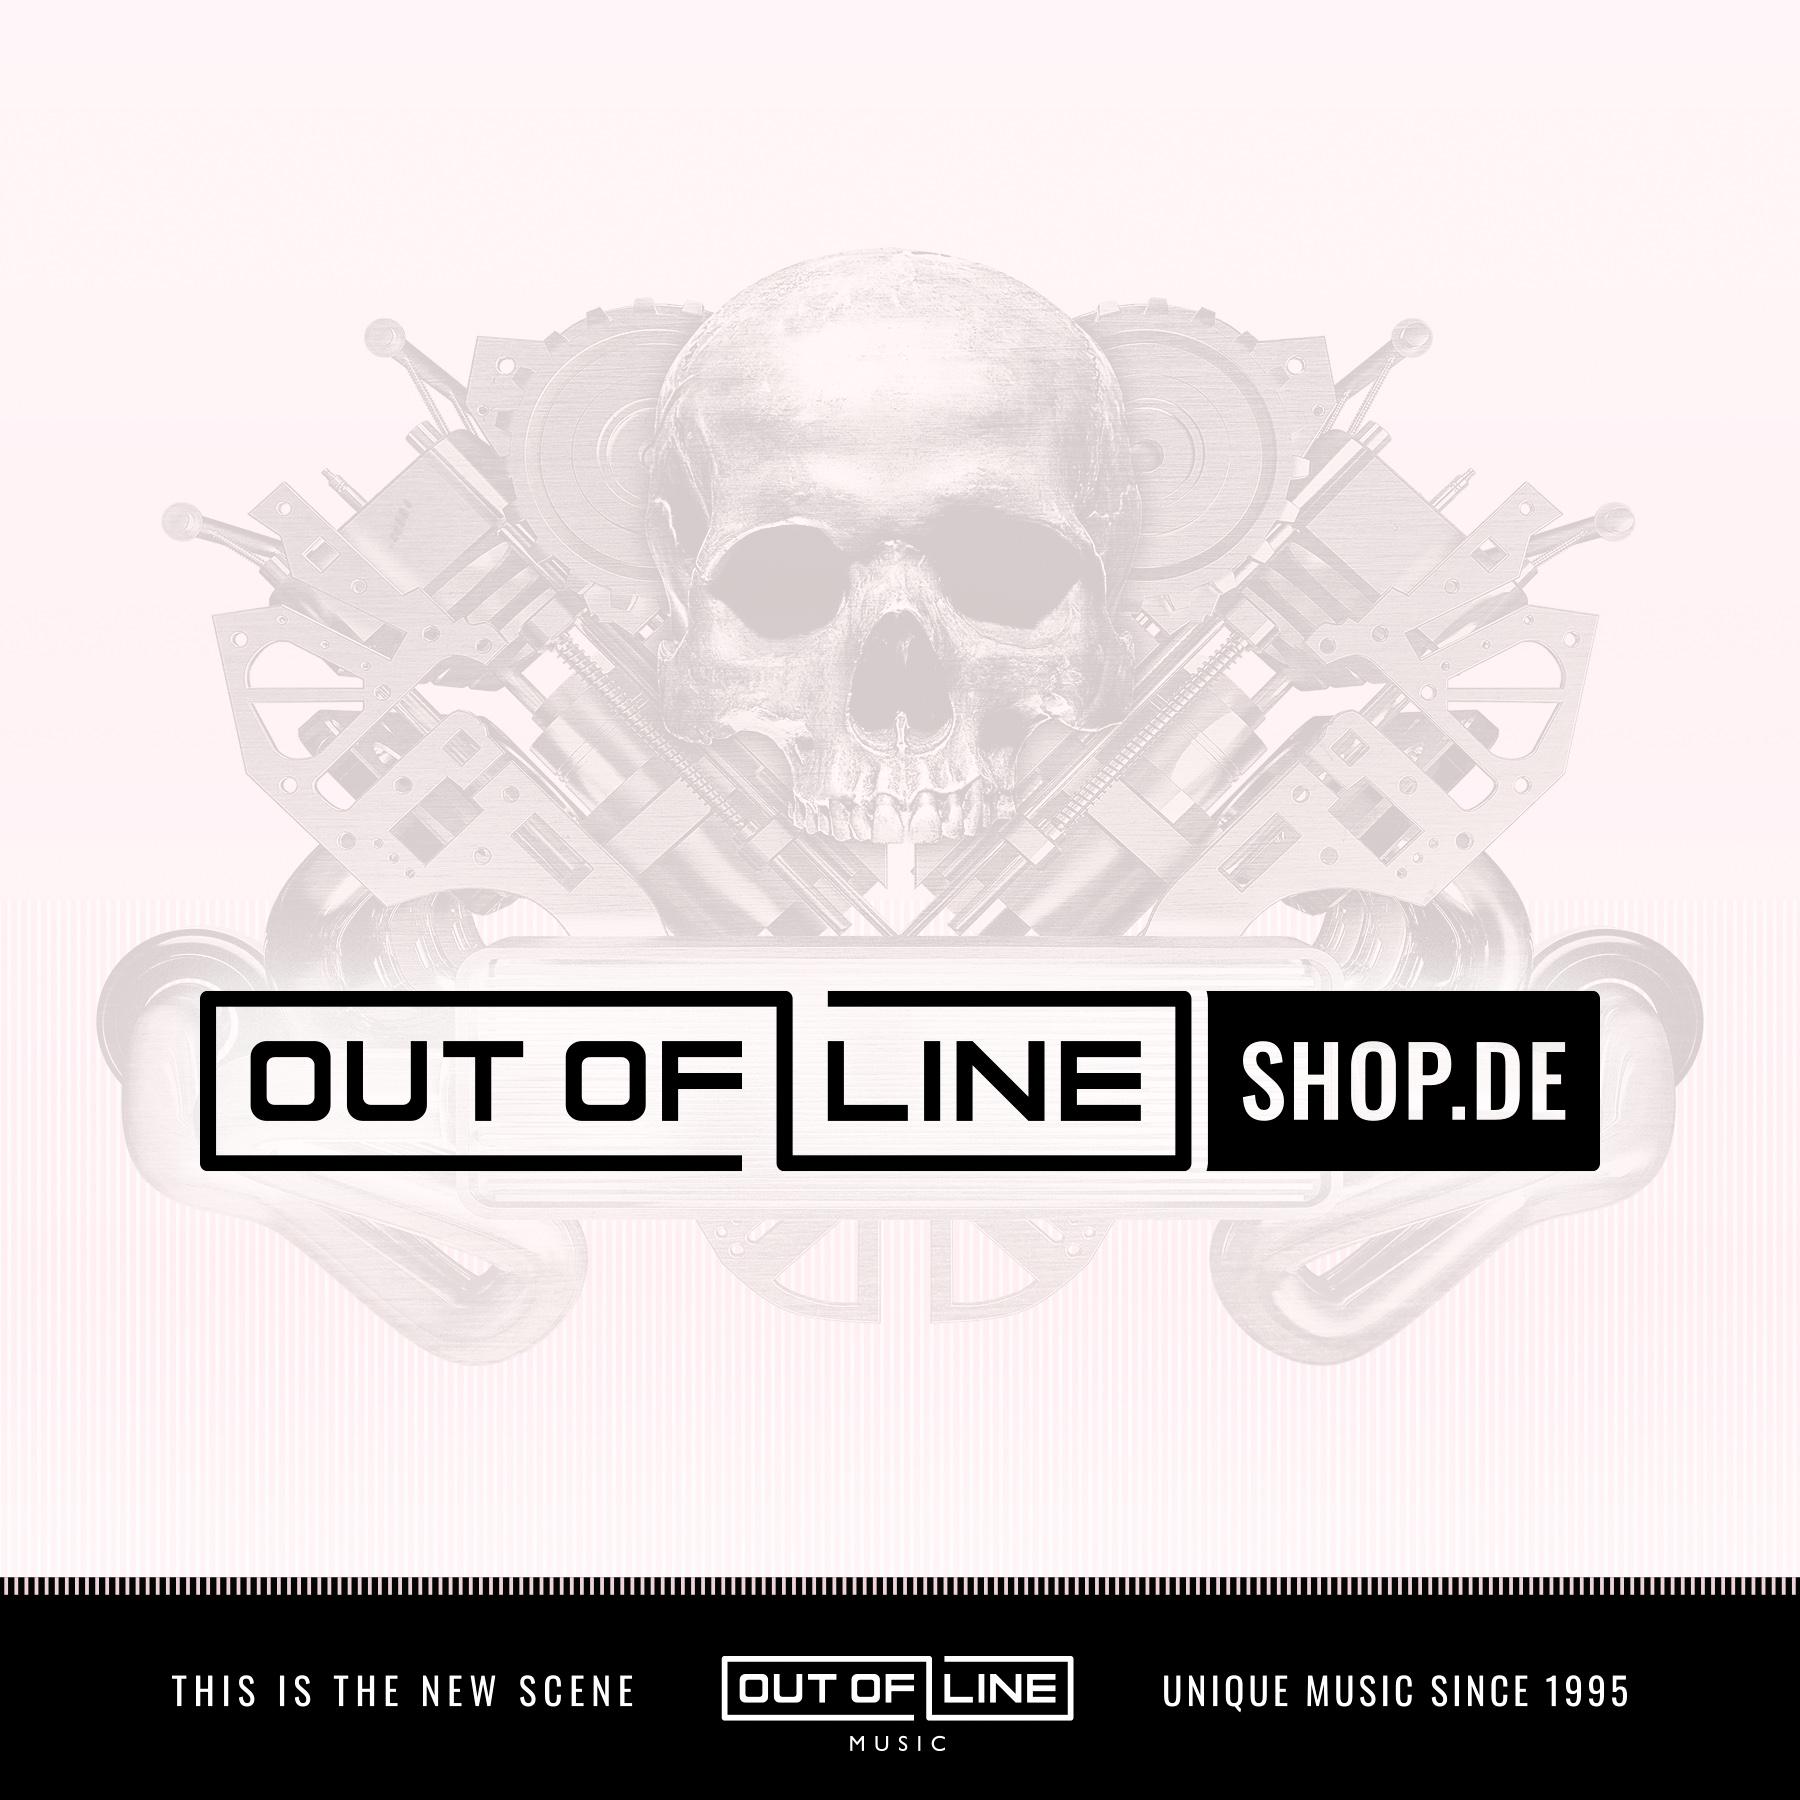 Erdling - Yggdrasil (Deluxe Edition) - 2CD